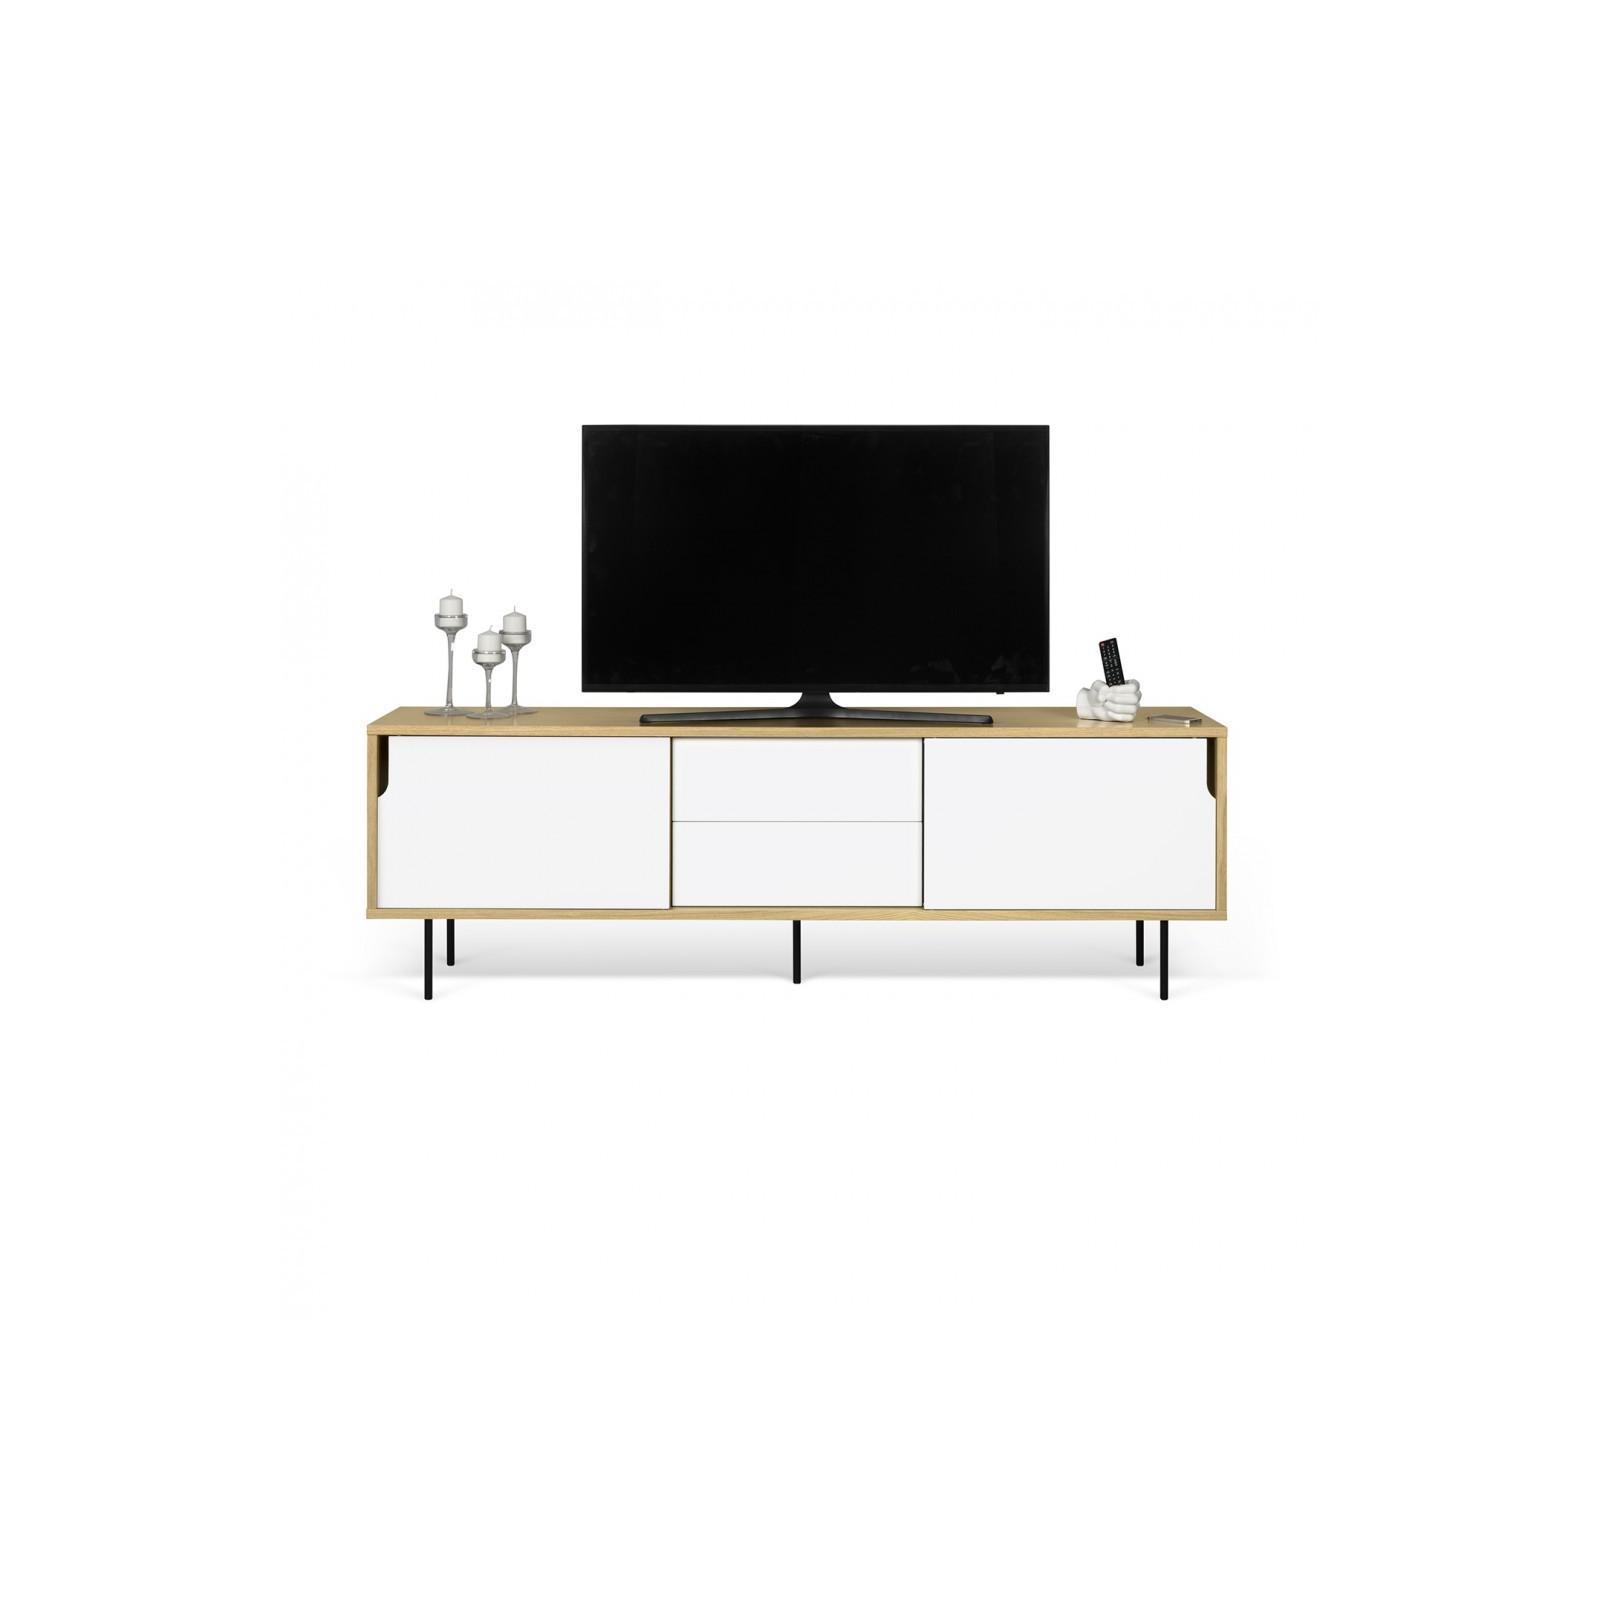 Meuble Tv Danois Blanc Et Bois Arne Concept # Meuble Tv Bois Blanc